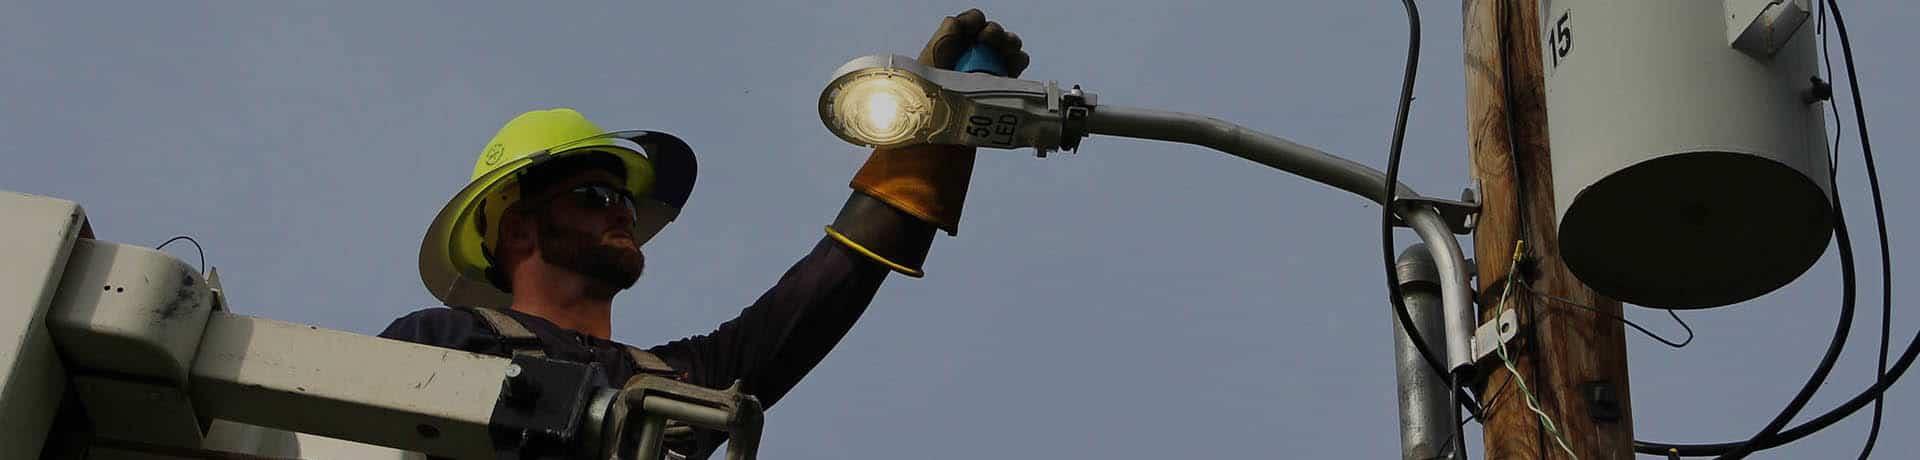 Security Light Lease Program banner image